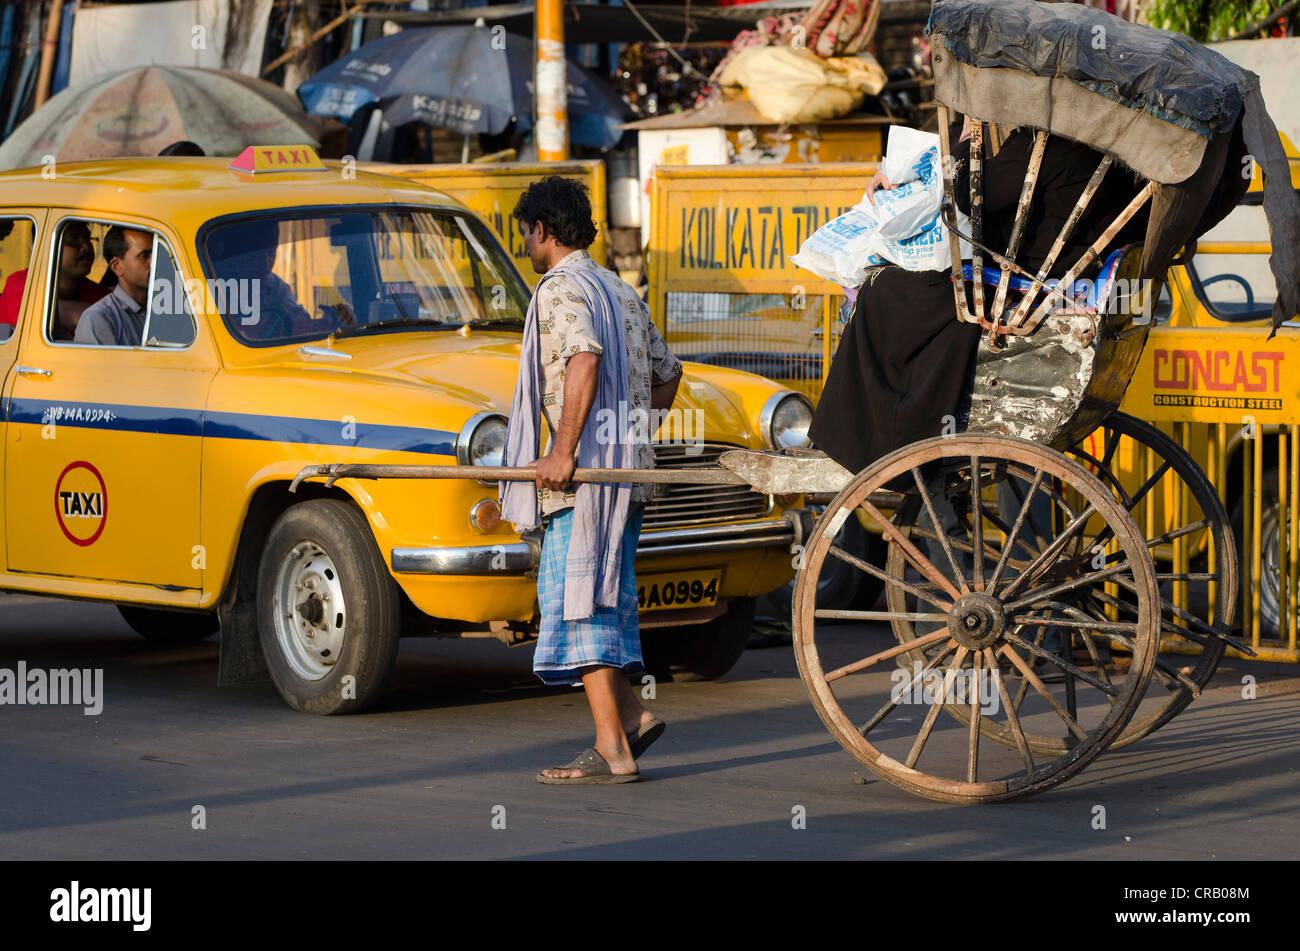 Rickshaw, Jawaharlal Nehru Road, Calcutta, Kolkata, West Bengal, India - Stock Image